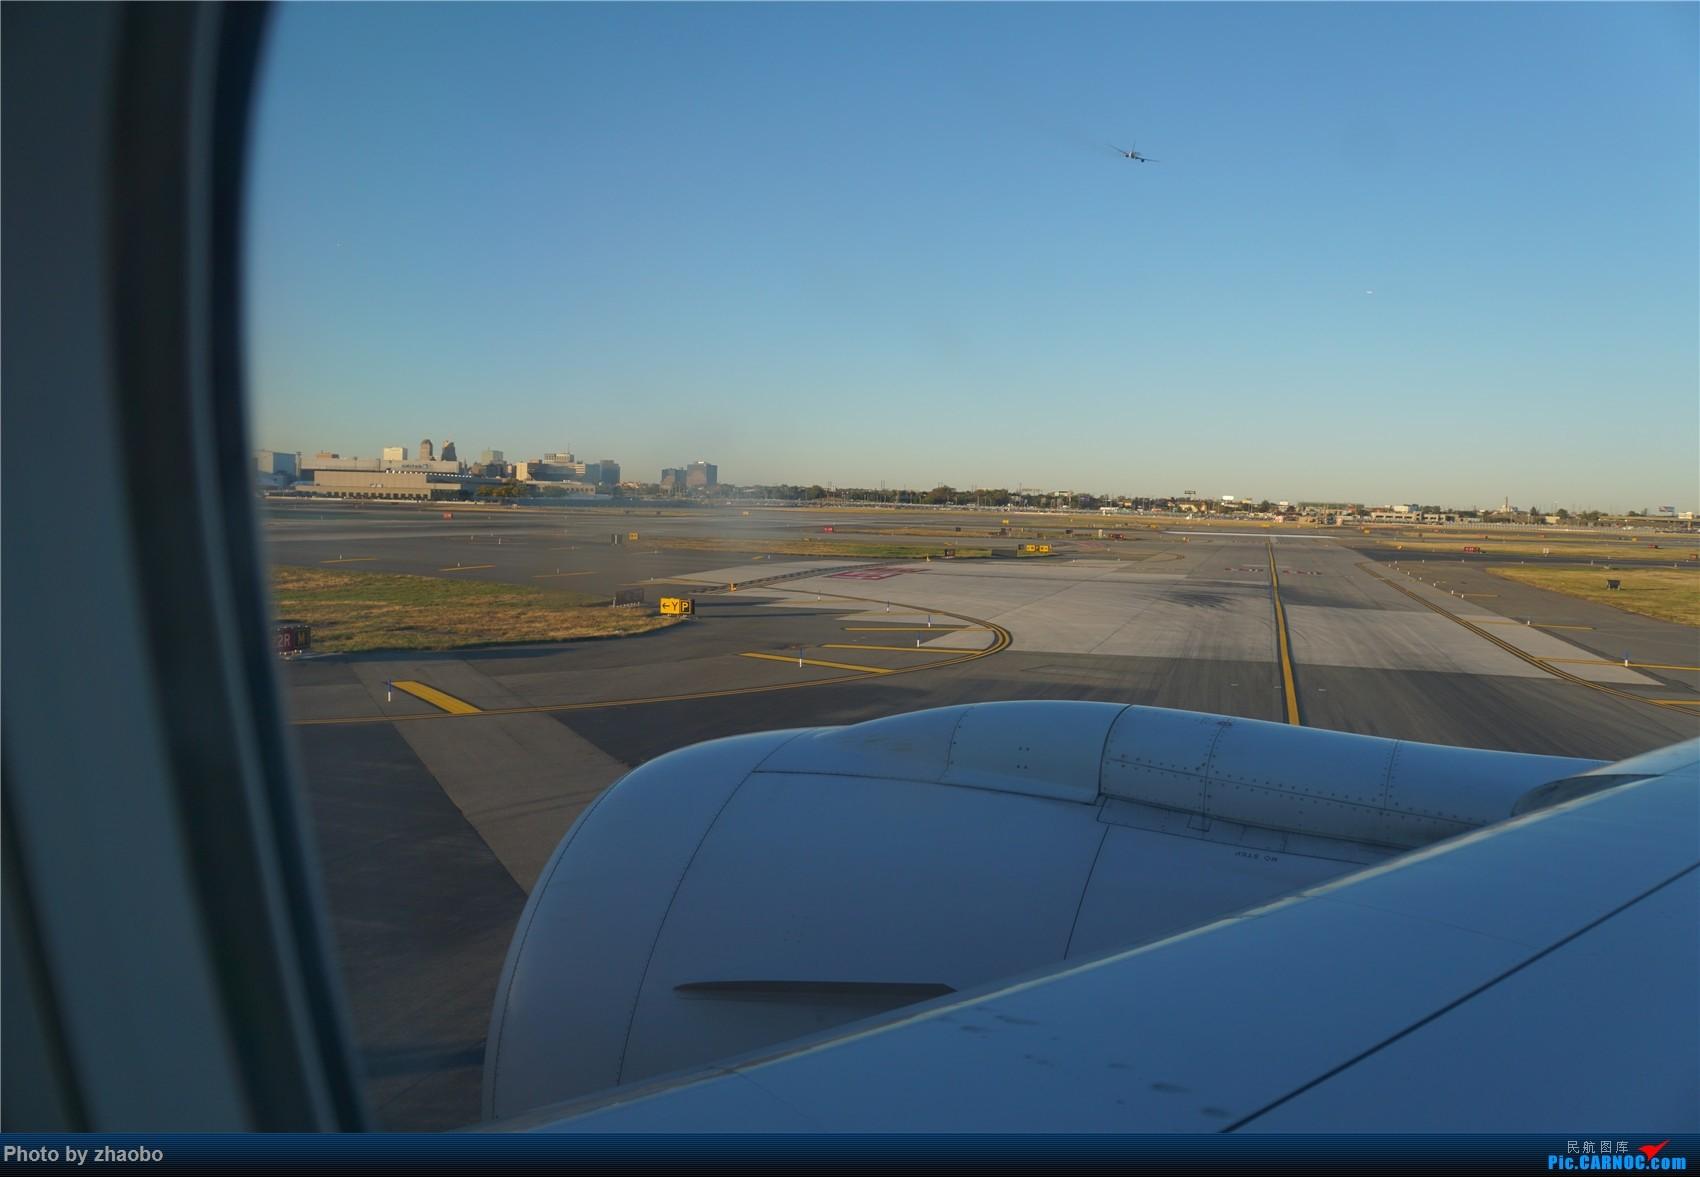 Re:从东到西游美国:美联航,美廉航?感受浦东机场最美国际航线 PVG-EWRWR BOEING 777-200  浦东